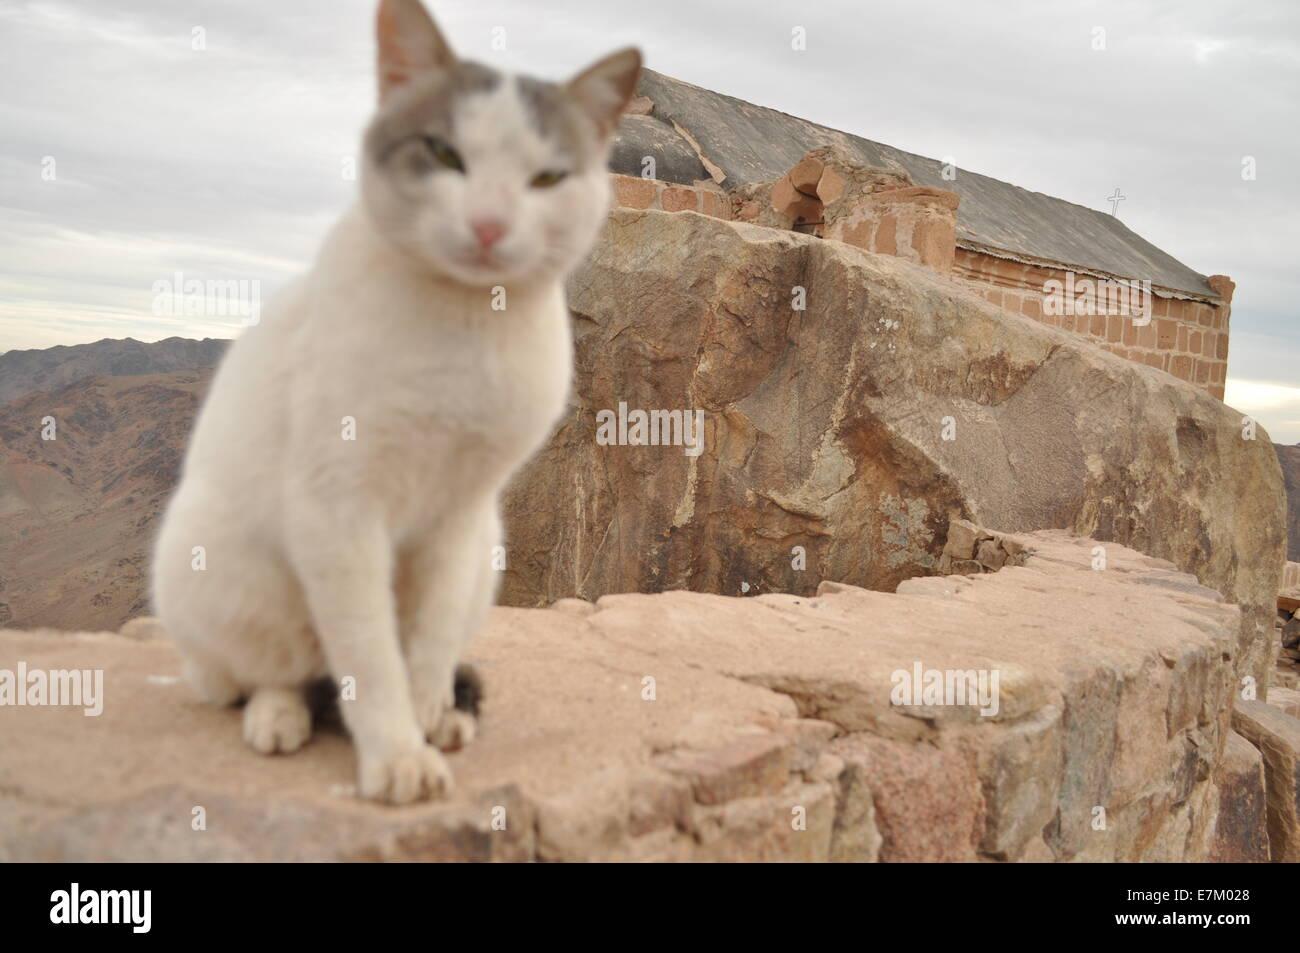 Egypt, the summit of Mount Sinai - Stock Image